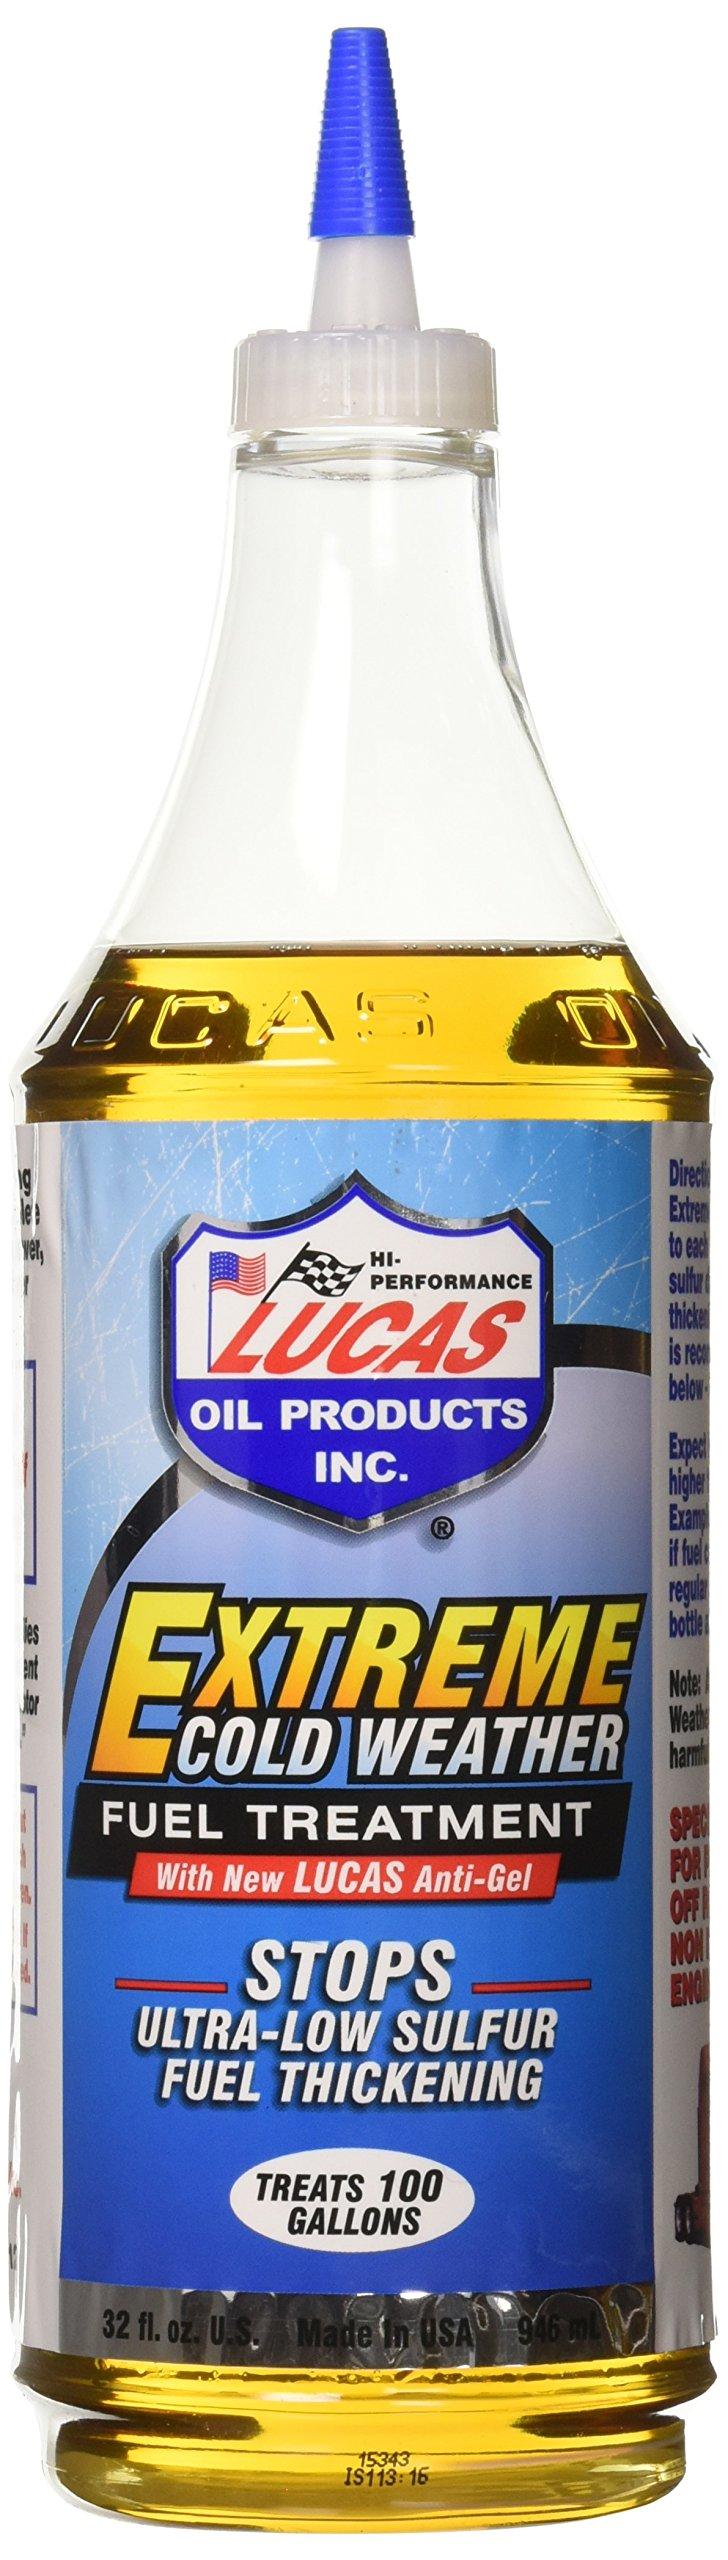 Lucas Oil 10012 Extreme Cold Weather Fuel Treatment, 1 Quart, (Case of 12) by Lucas Oil